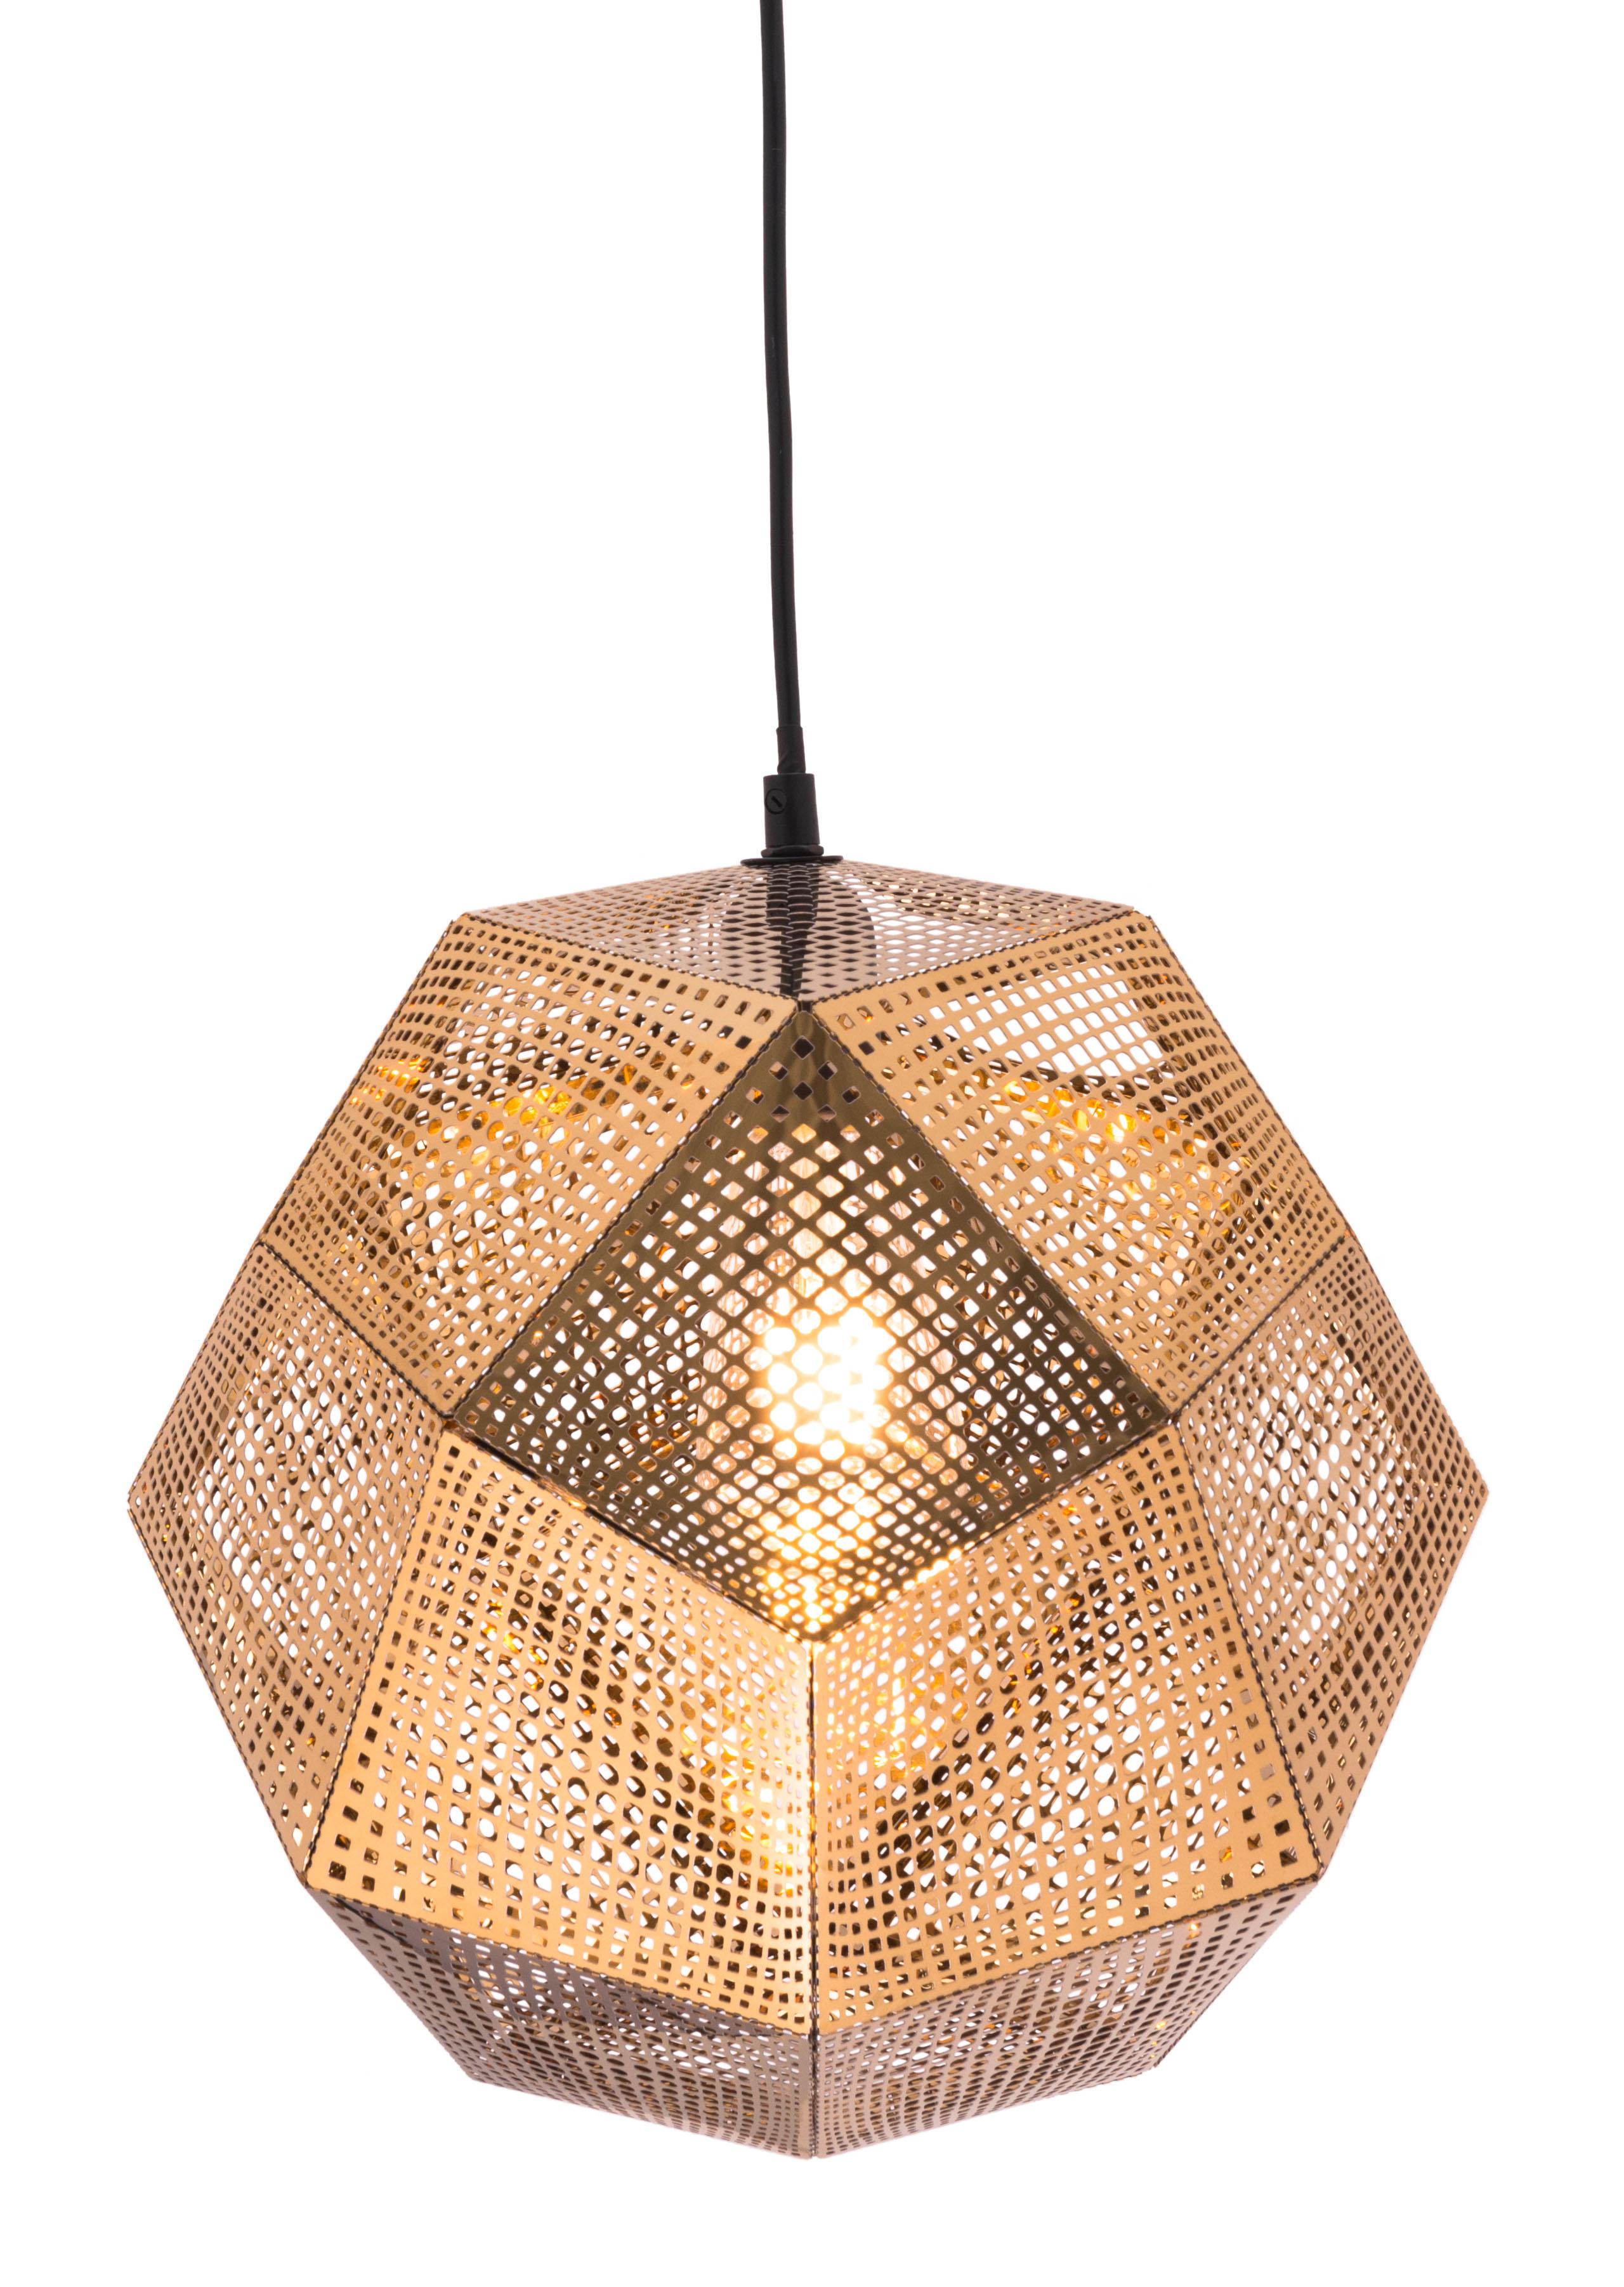 zuo-bald-ceiling-lamp-gold.jpg